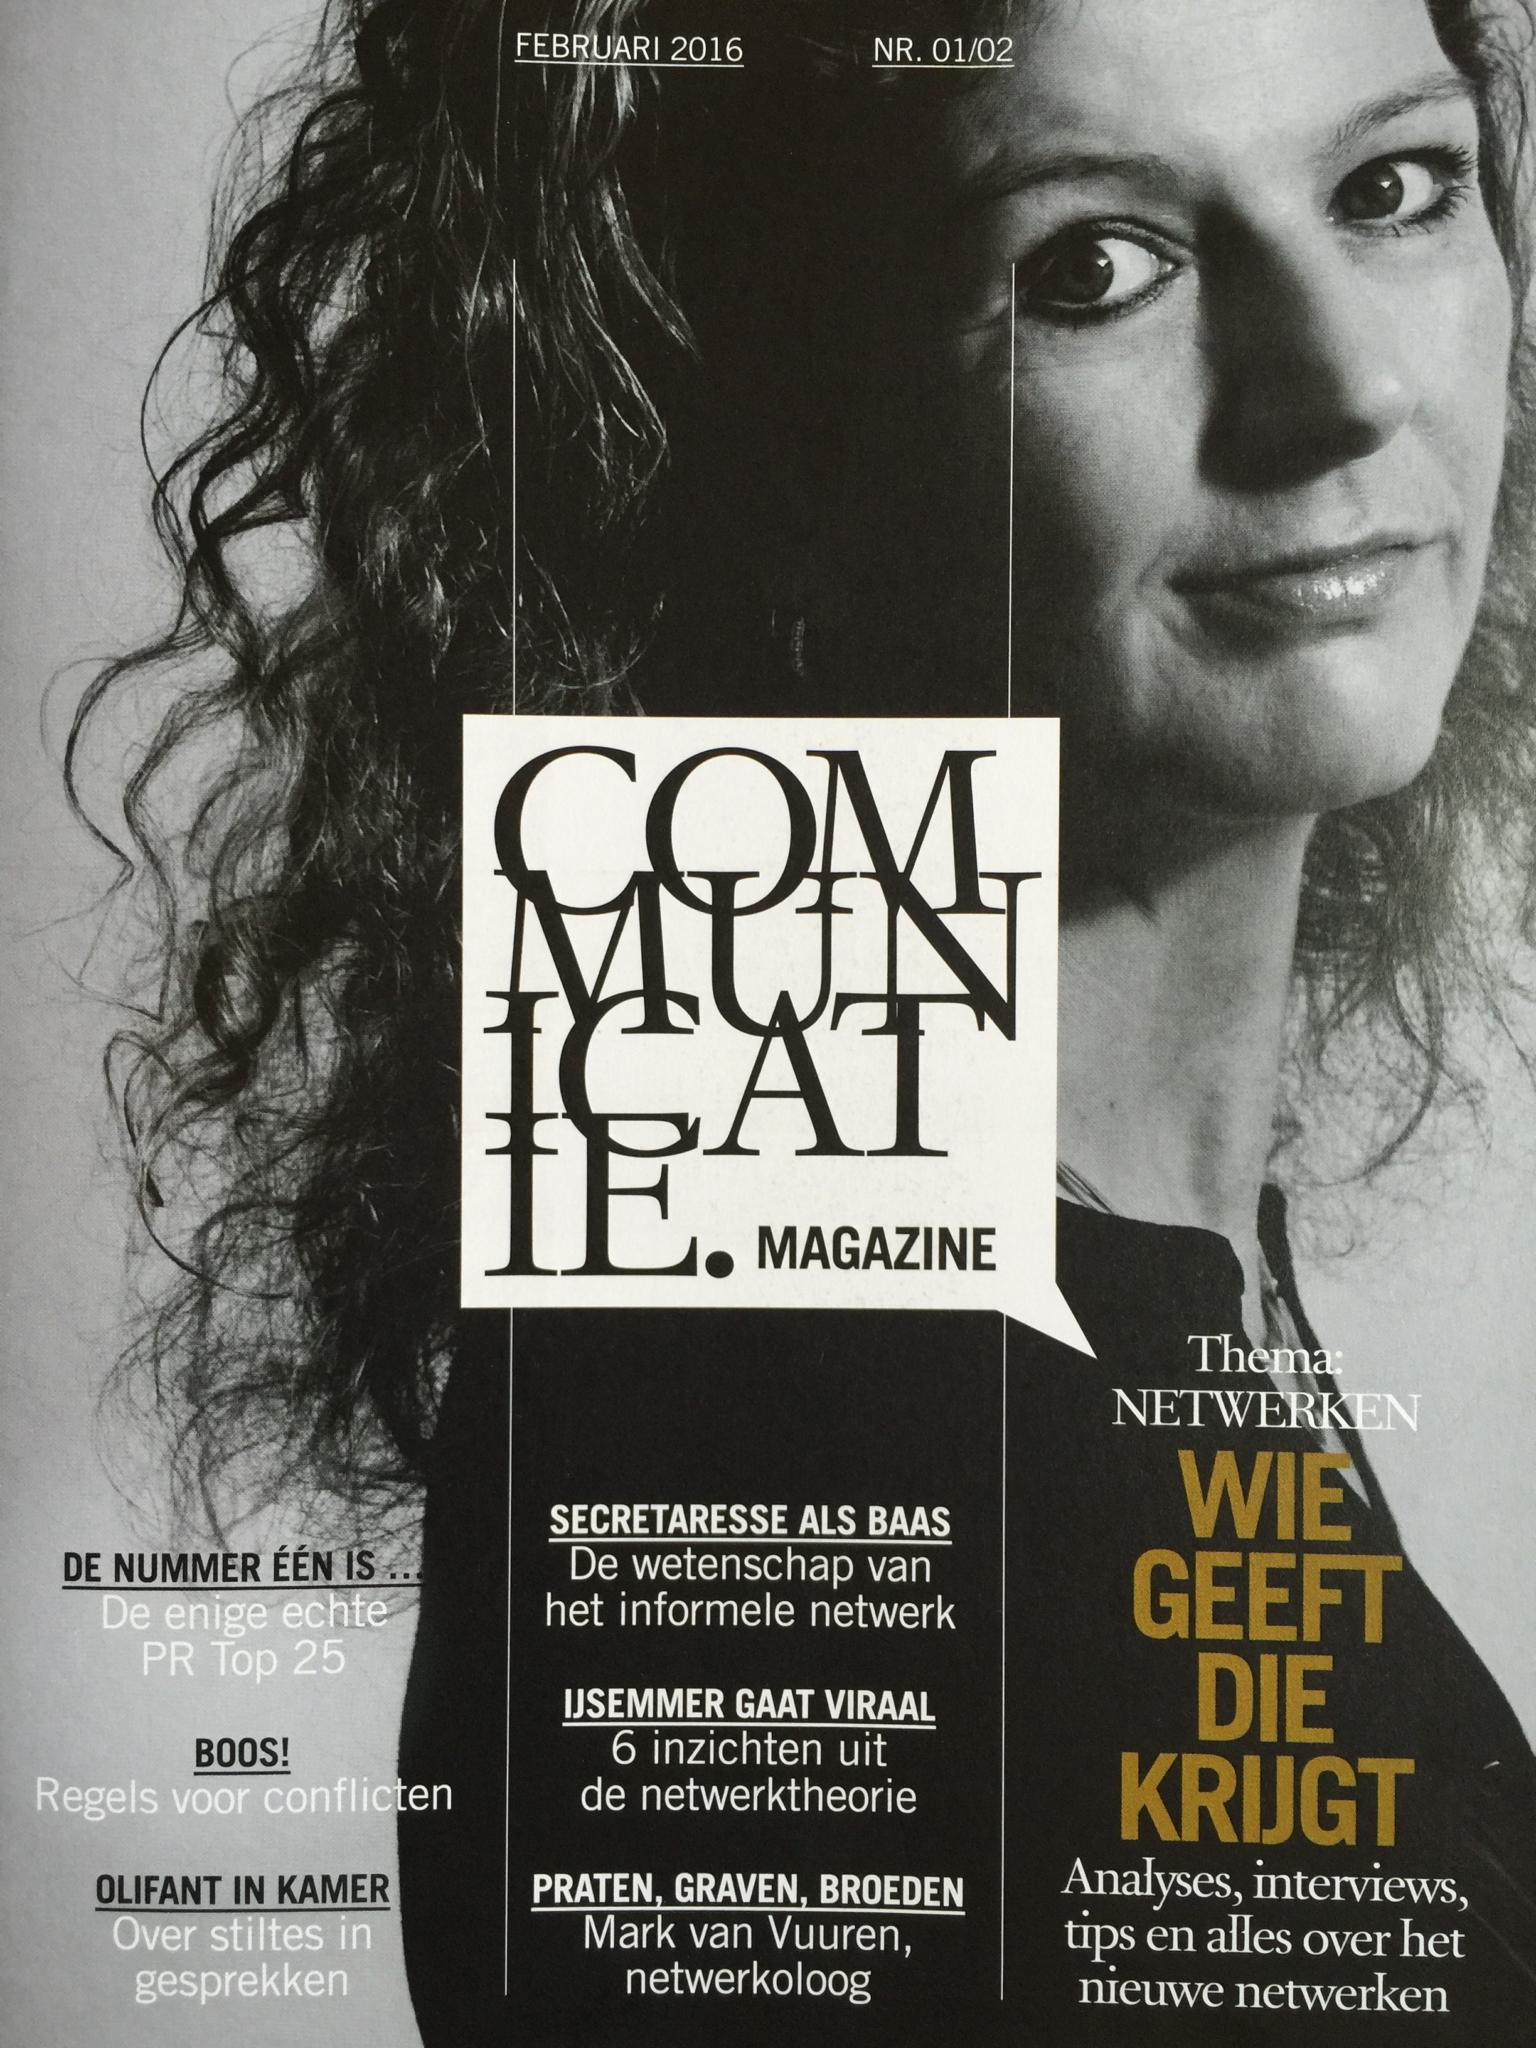 netwerken 2.0 communicatie magazine